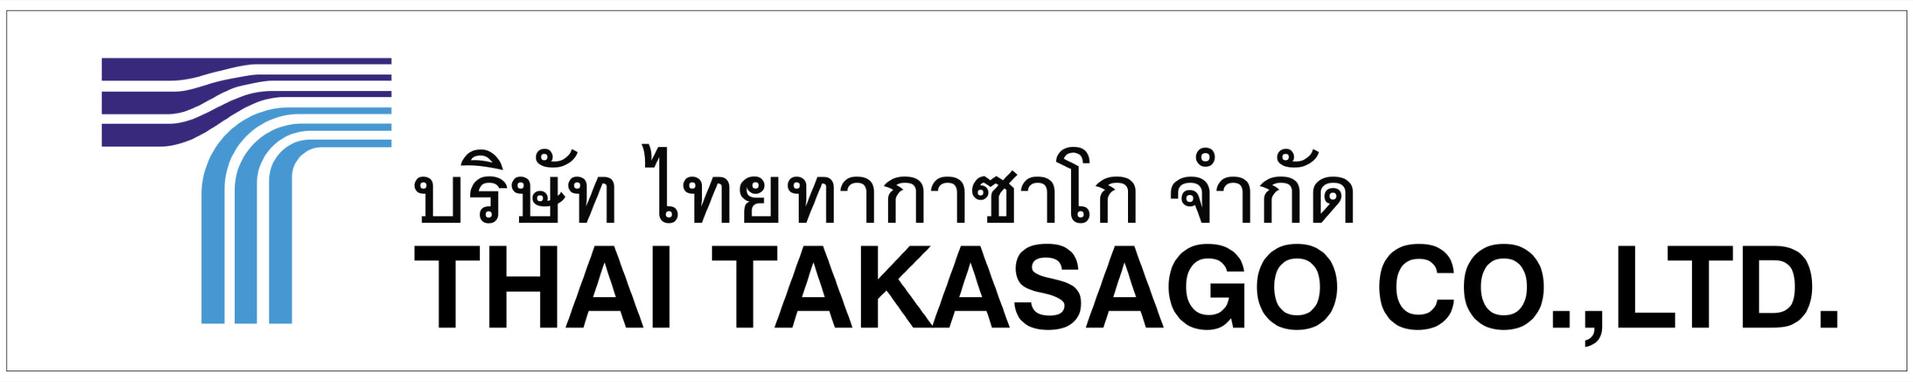 Thai Takasago Co., Ltd.